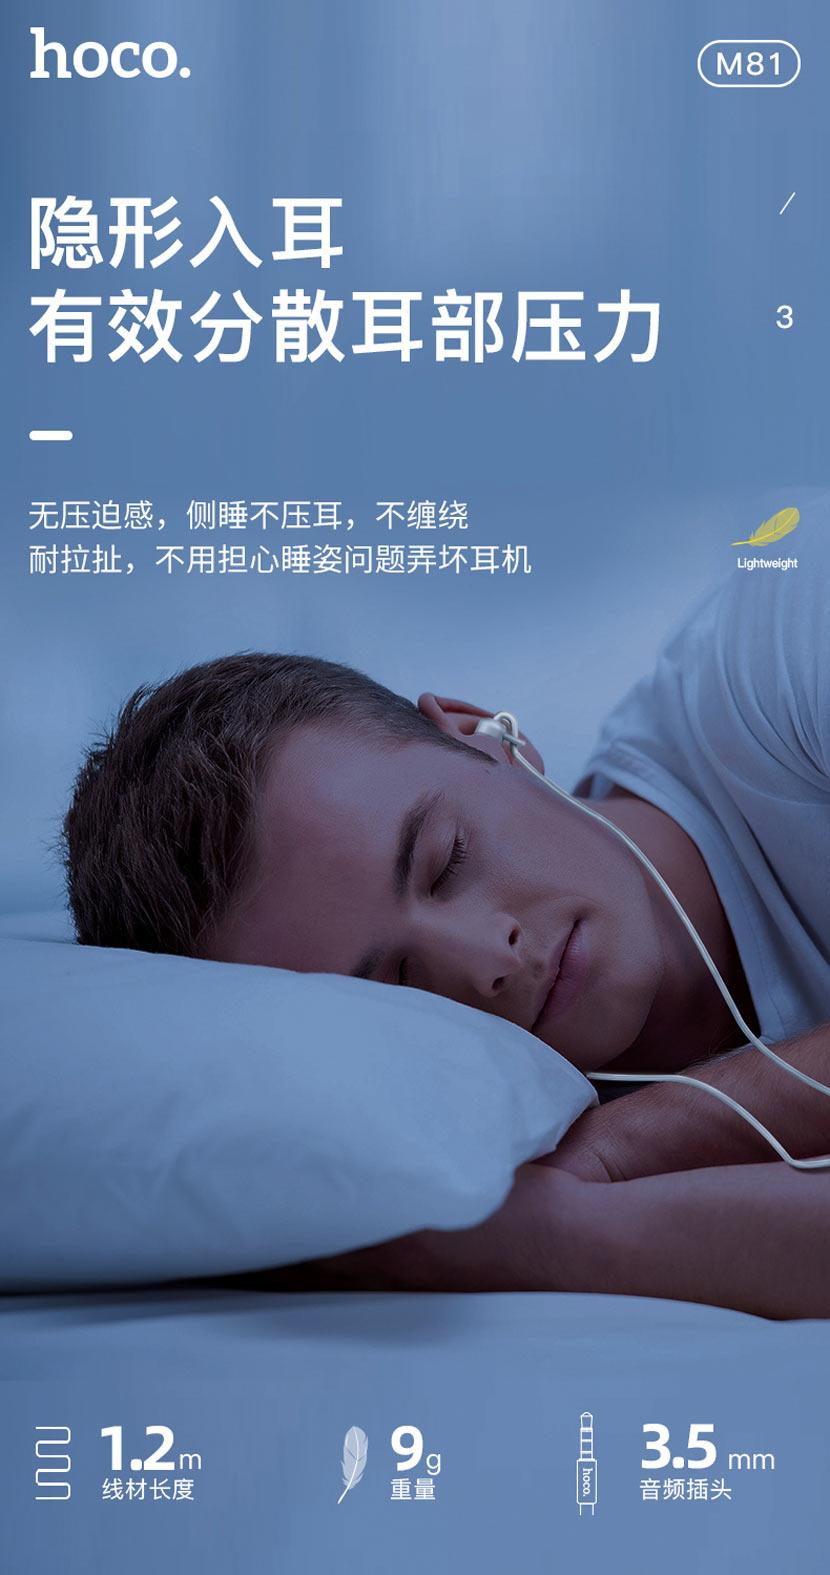 hoco news m81 imperceptible sleeping earphones with mic ear pressure cn